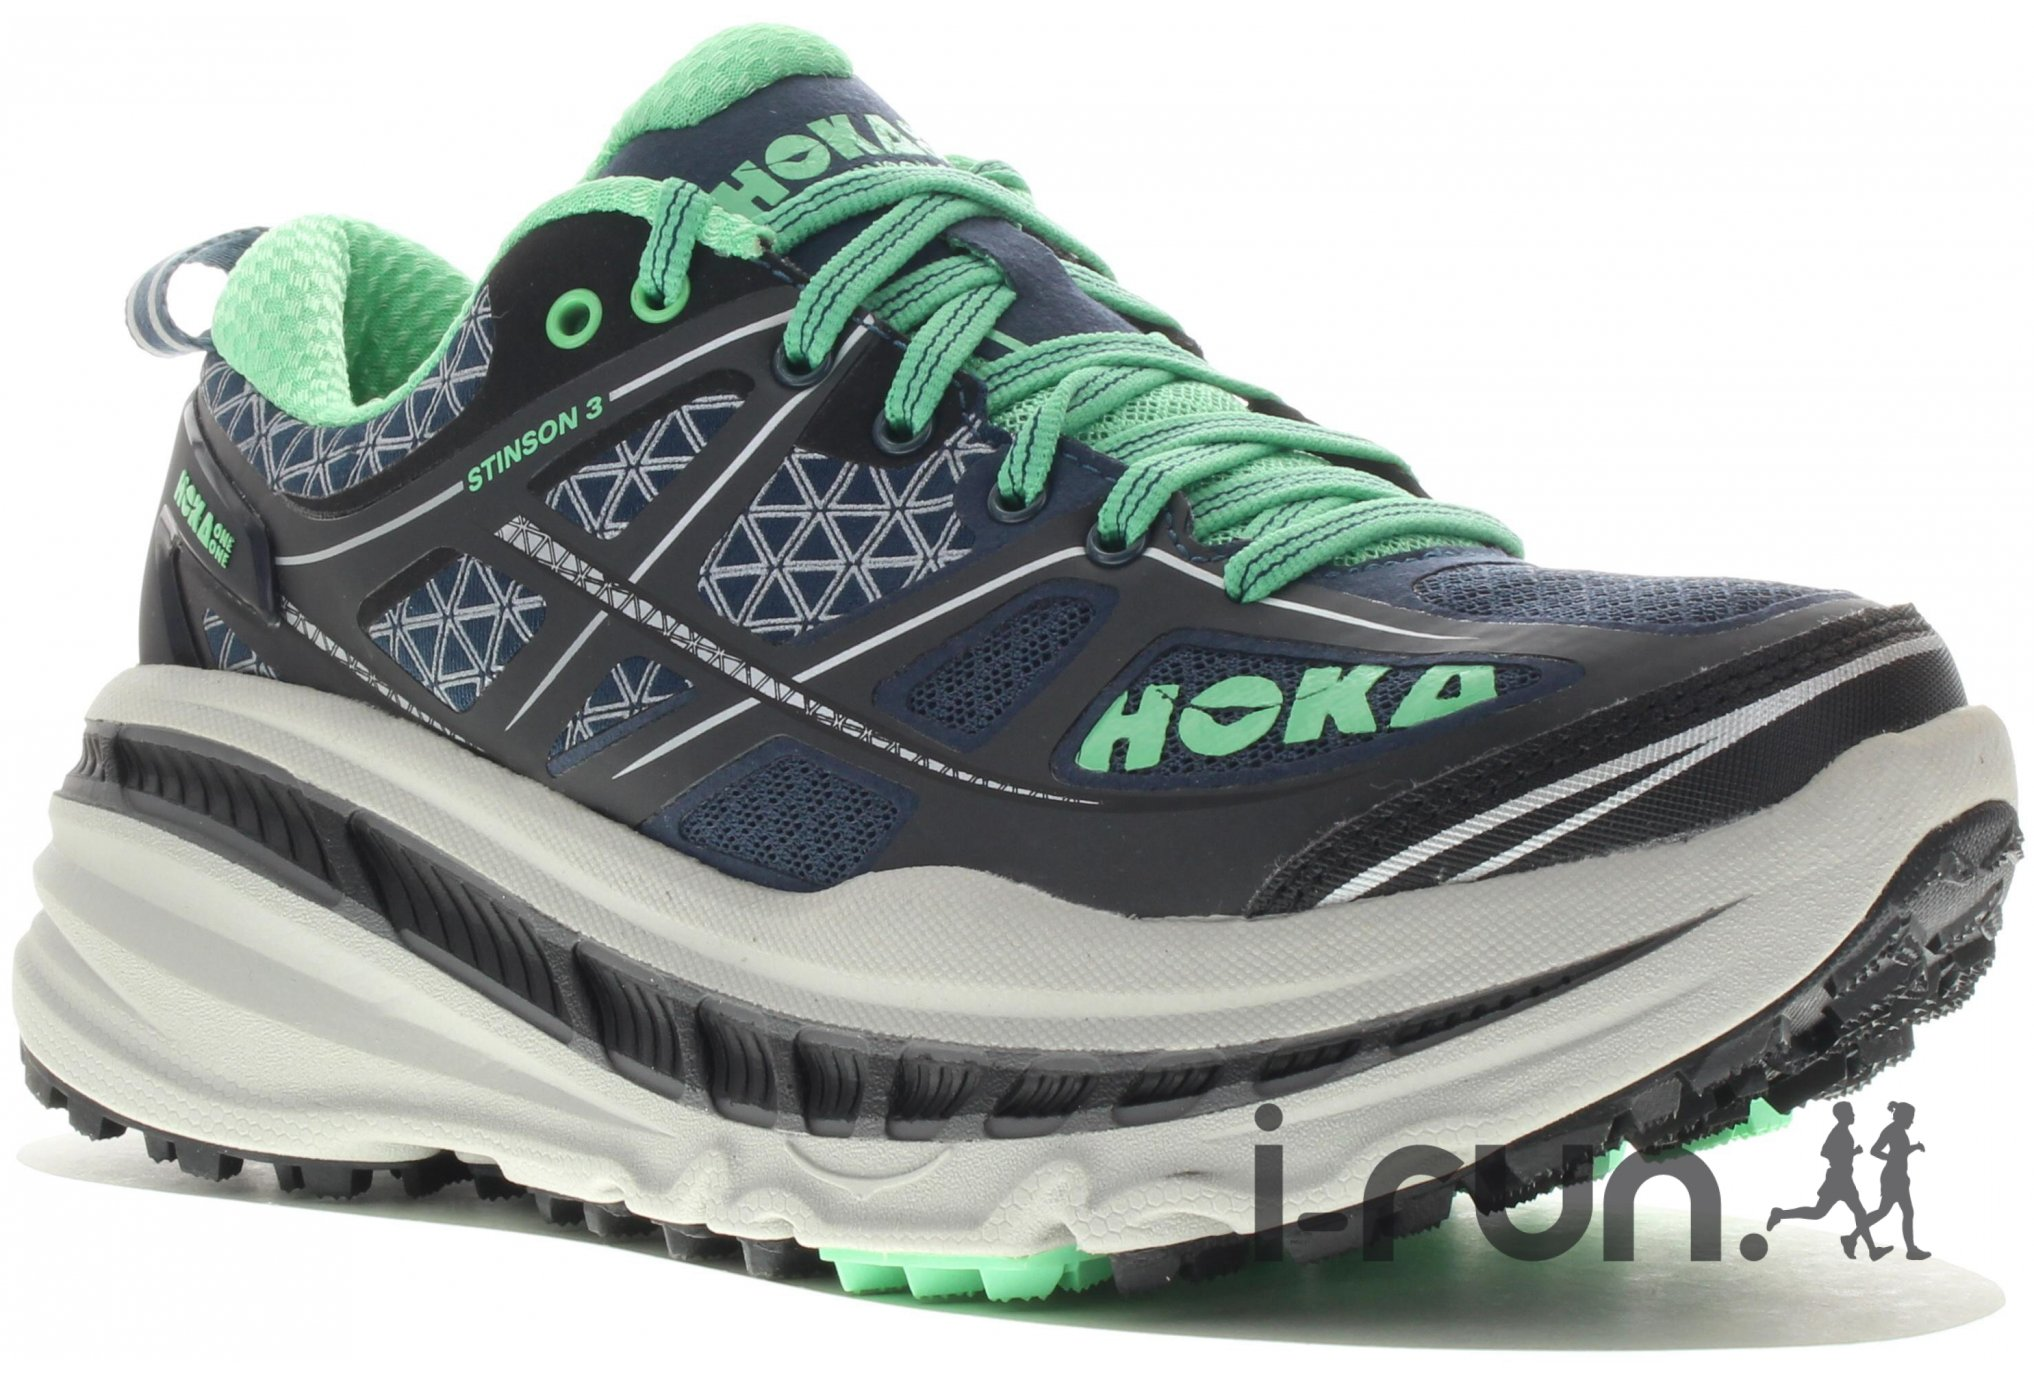 Hoka One One Stinson 3 ATR W Chaussures running femme